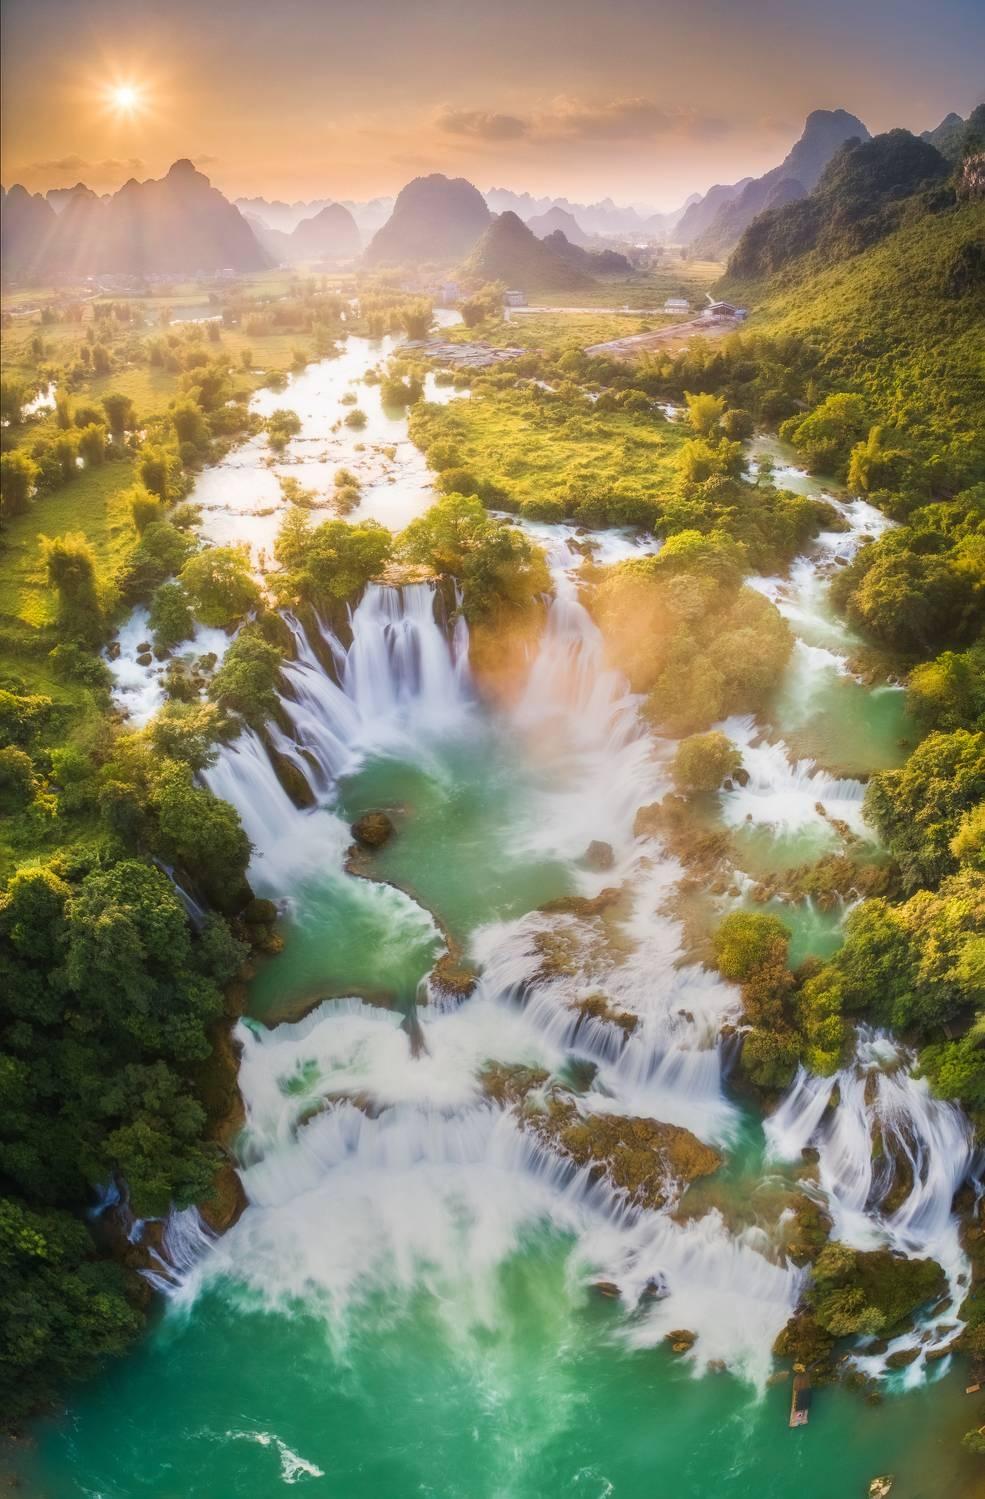 """Sunset on Ban Gioc Waterfall"" Photo: Vu Phi Long"